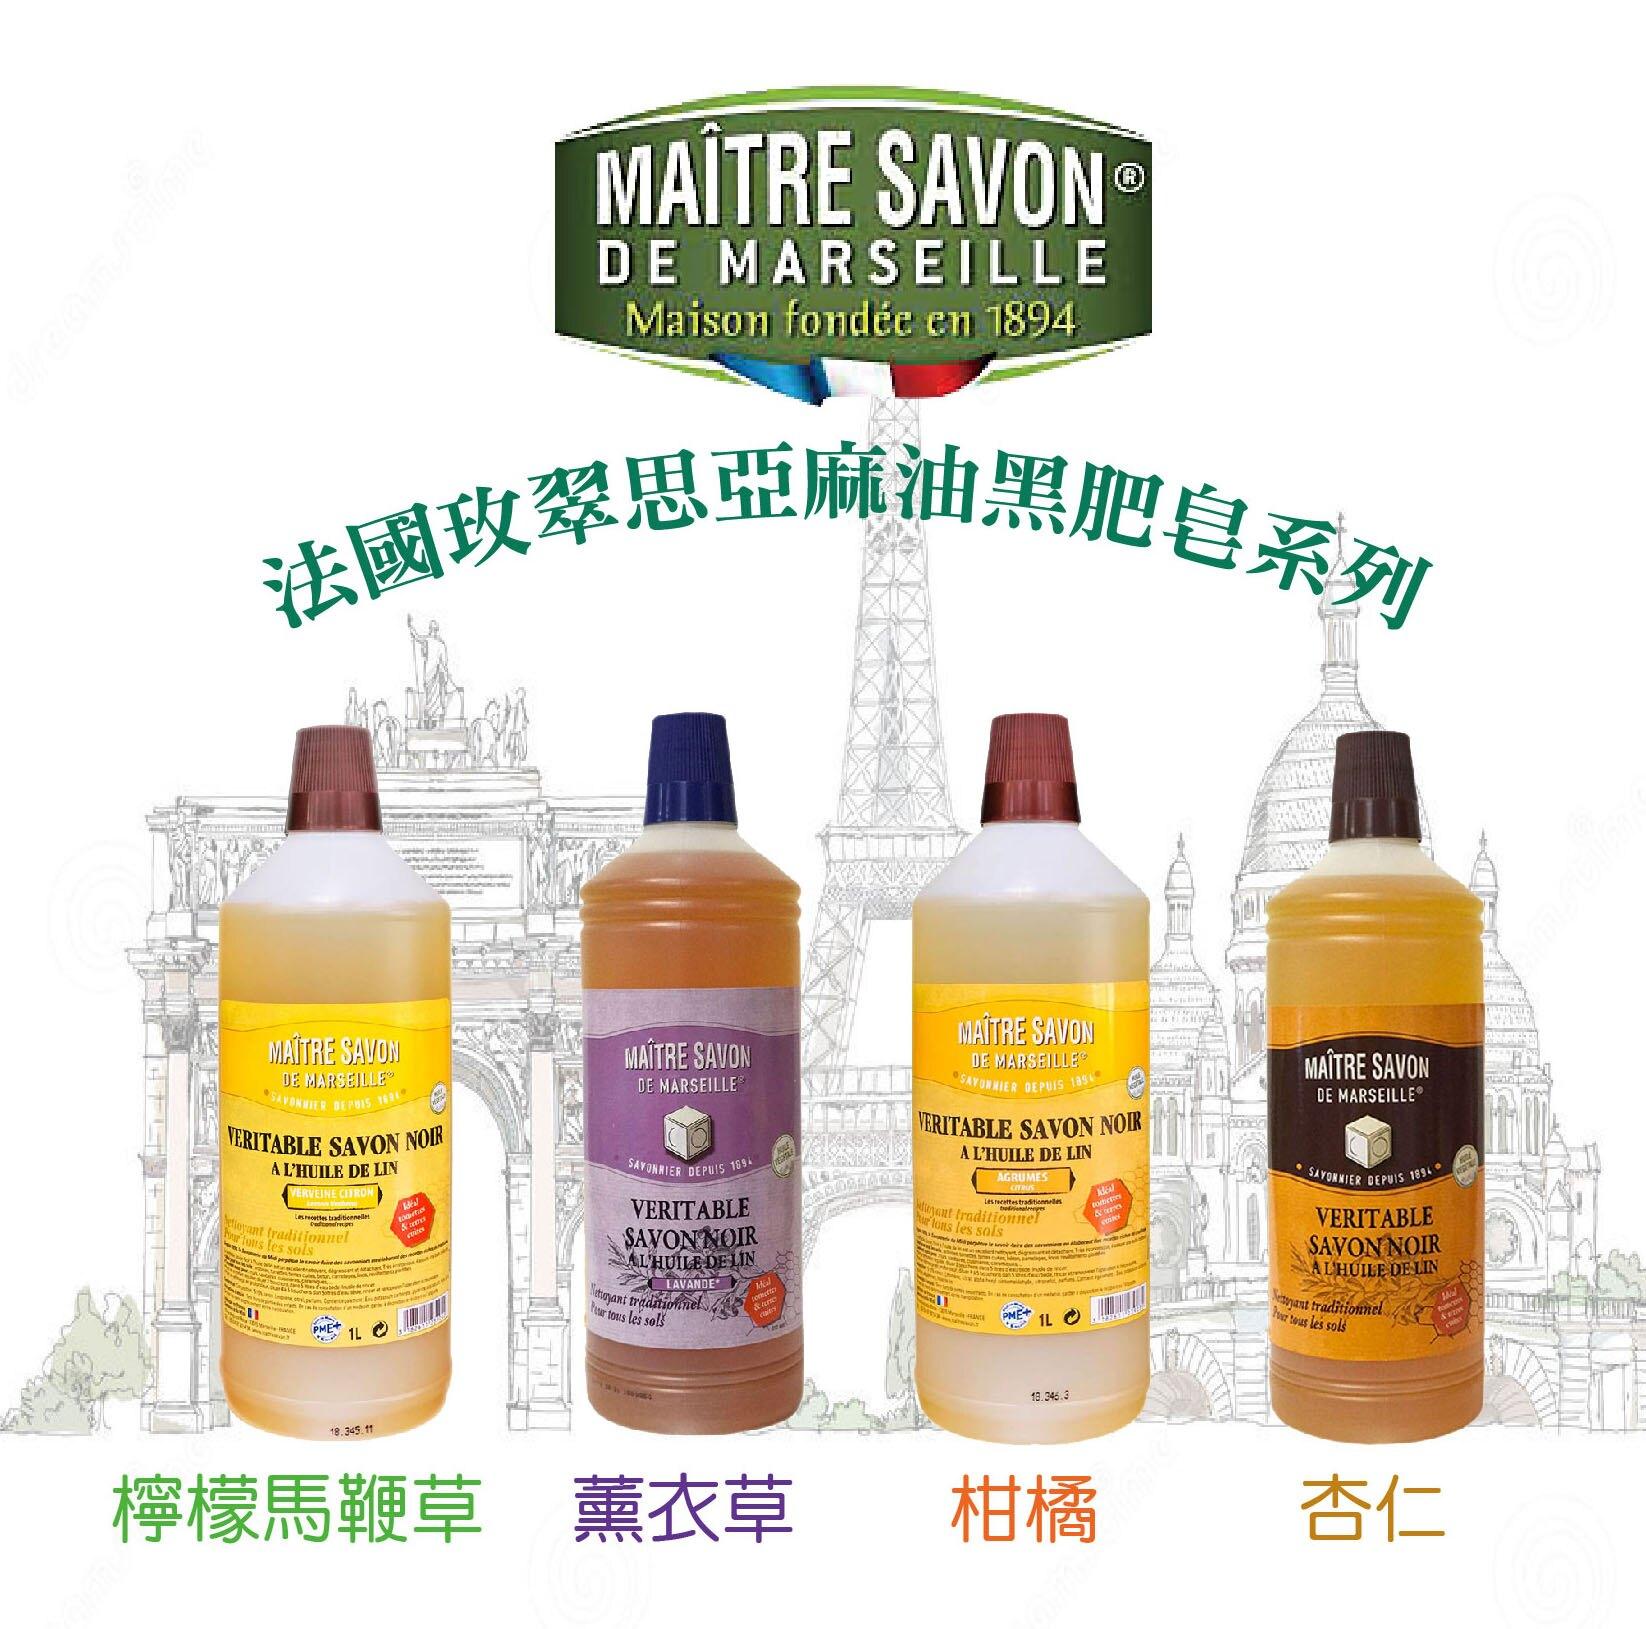 MAITRE SAVON 法國玫翠思 亞麻油黑肥皂(多用途清潔劑),共4款。